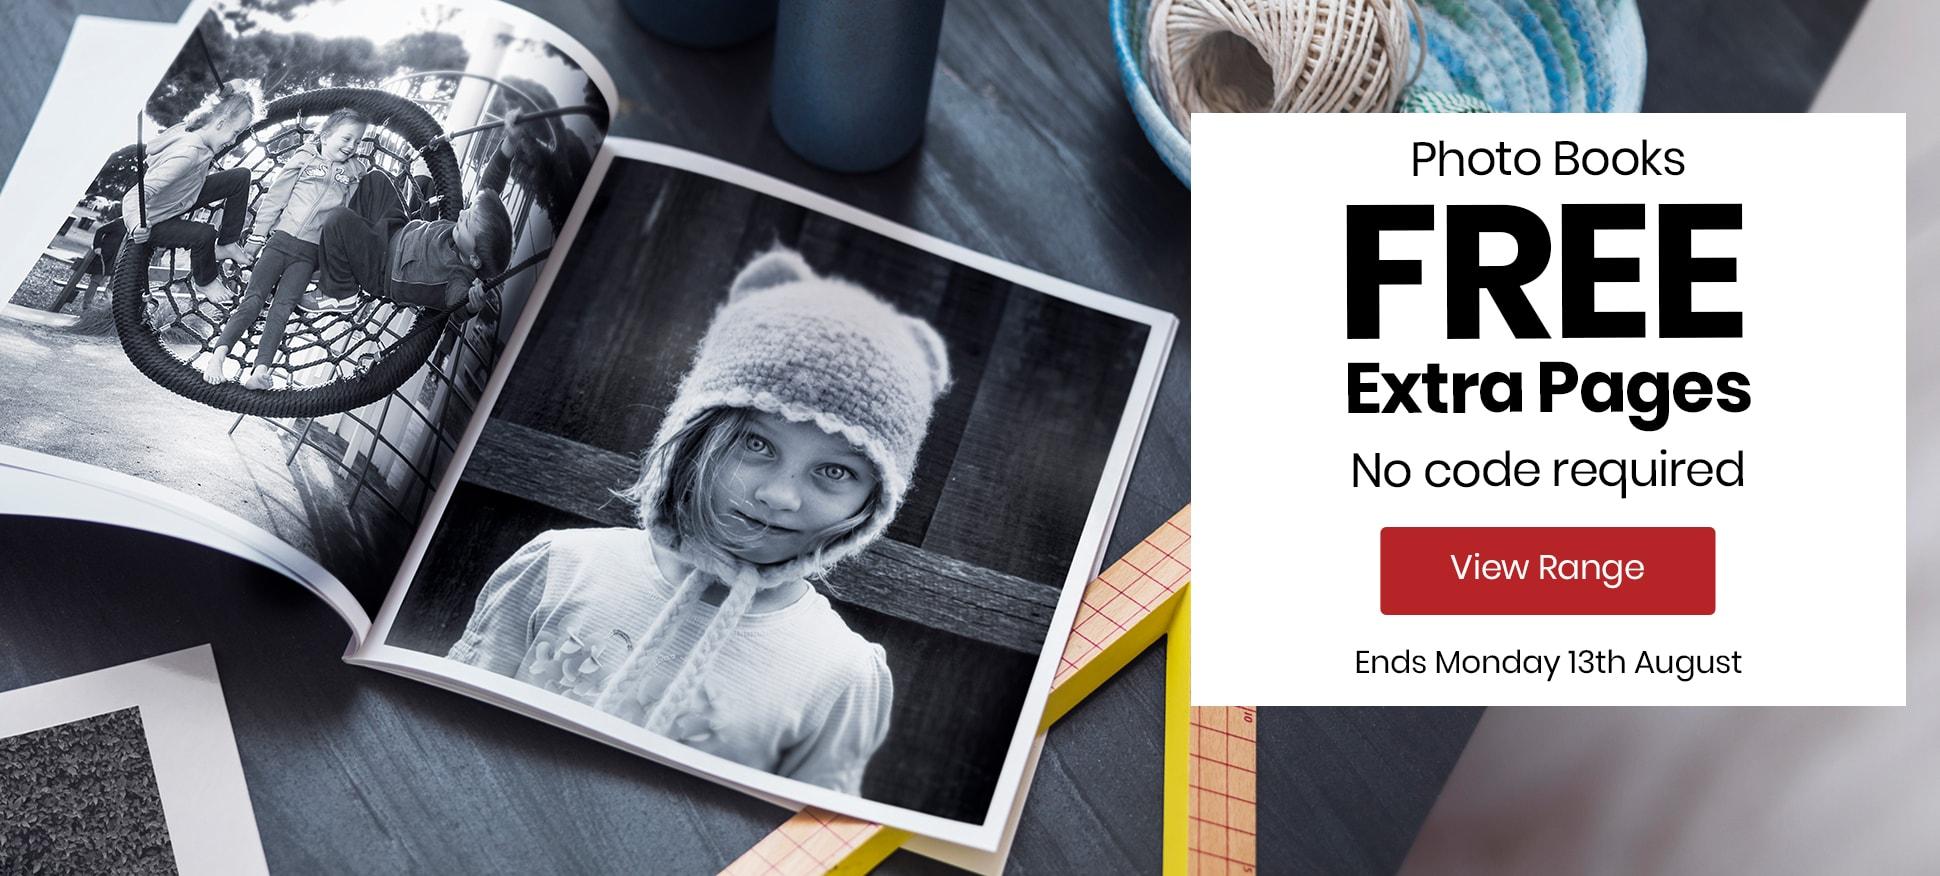 Bring Your Photos to Life! - Photobox